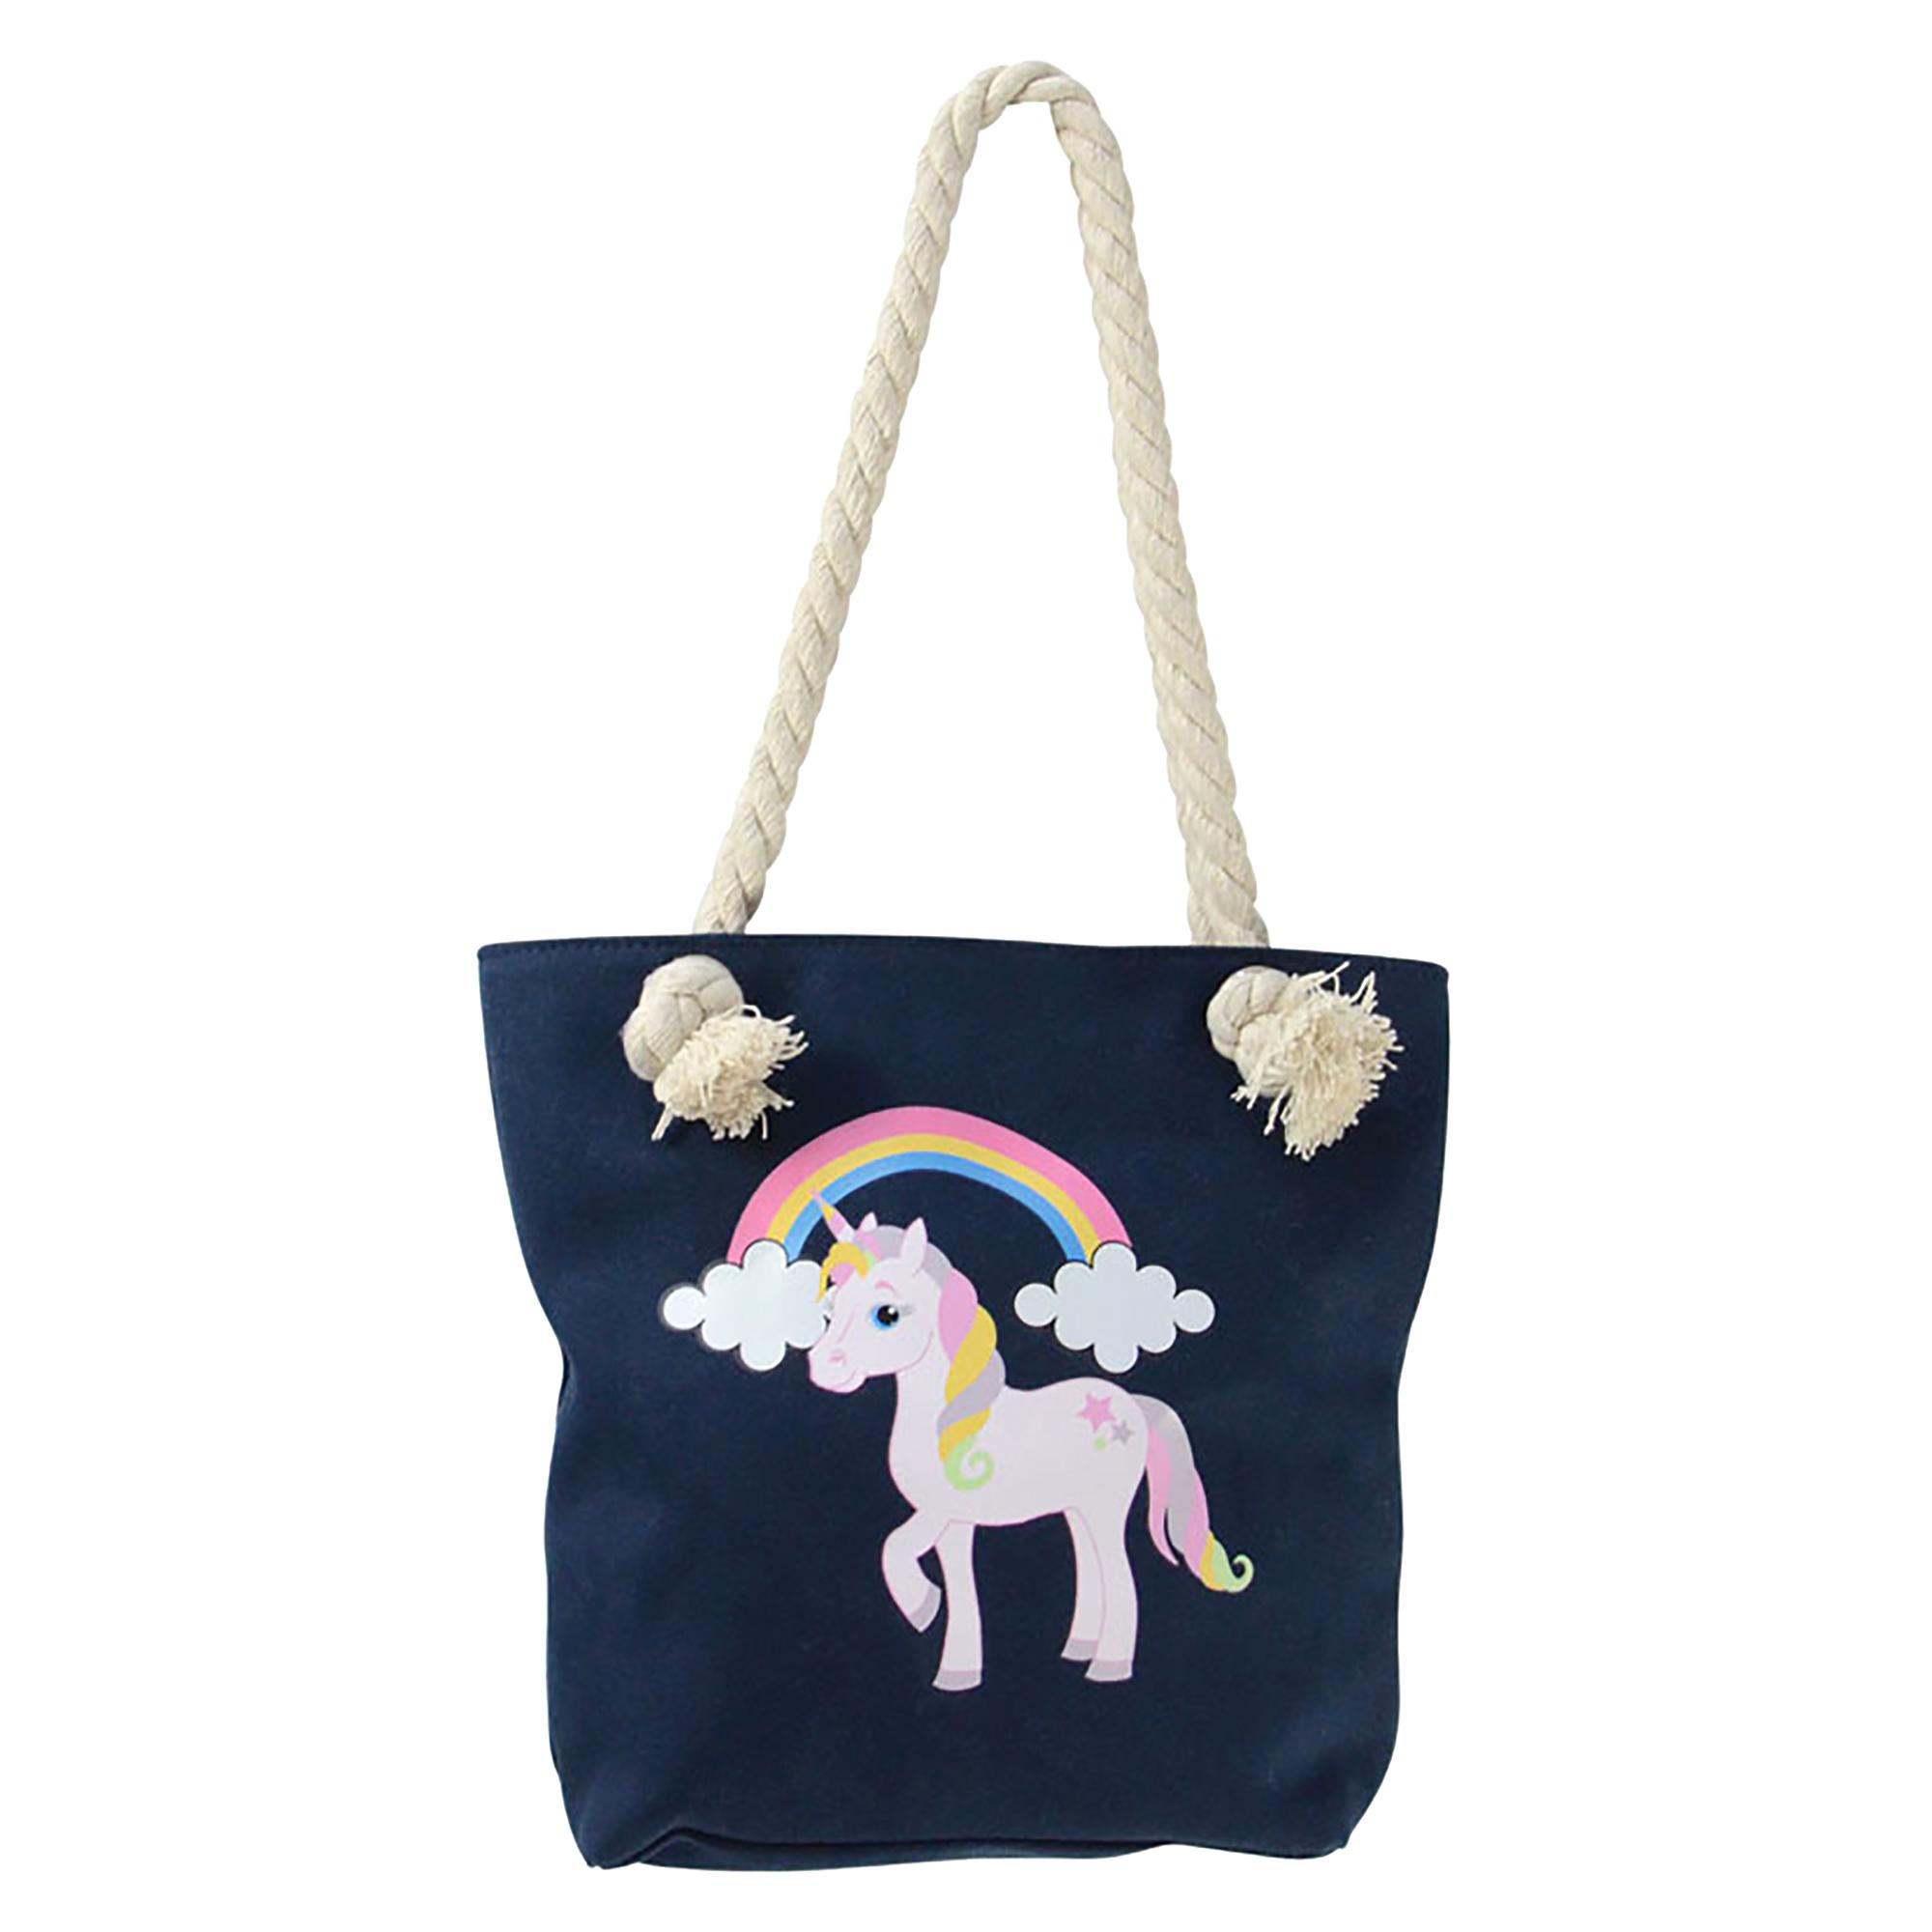 Little Rider Childrens/Kids Unicorn Tote Bag (One Size) (Navy)